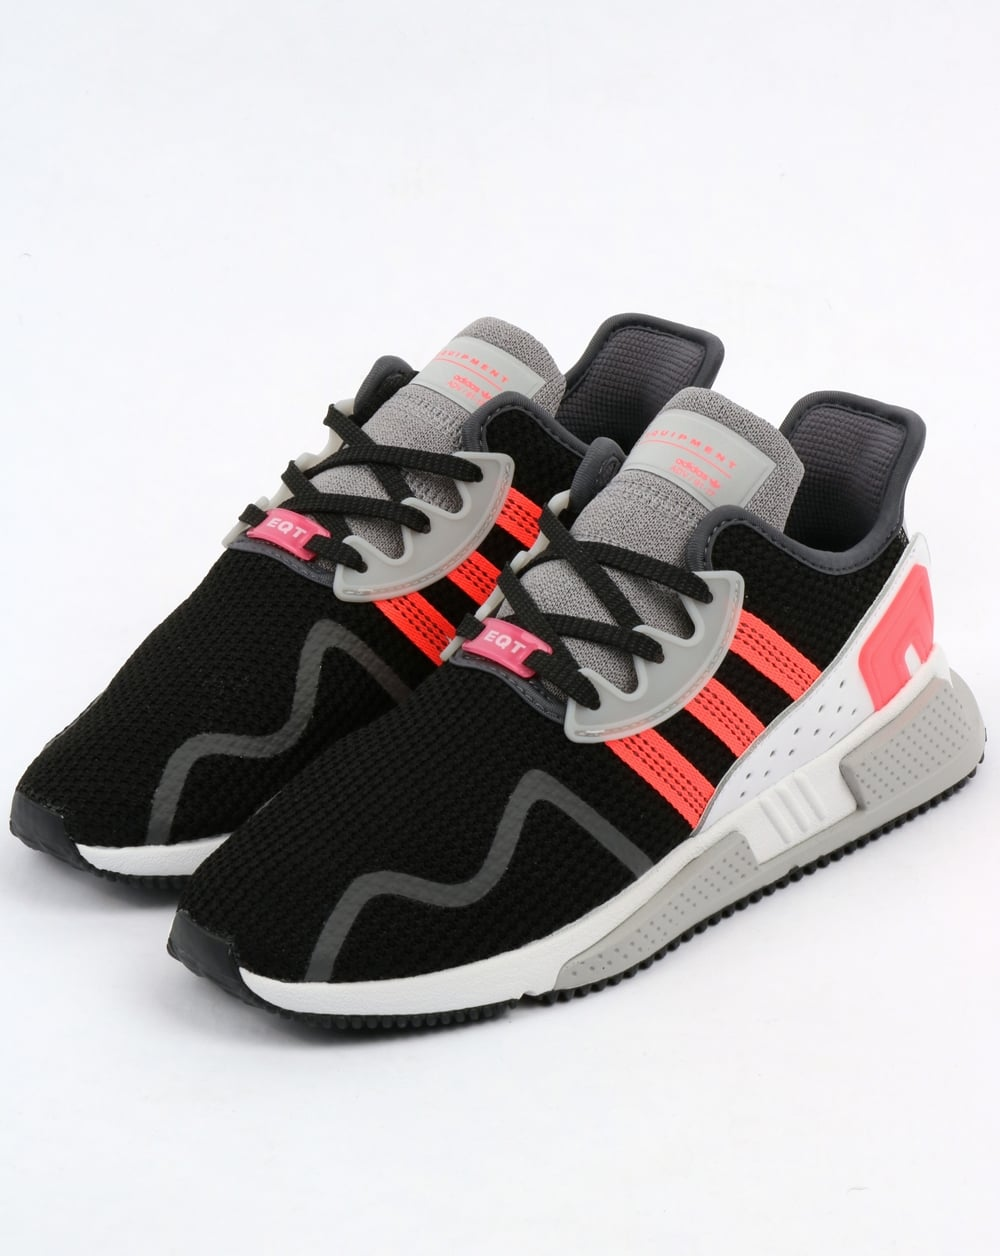 c8e762307e7a78 Adidas Eqt Cushion Adv Trainers Black Pink White